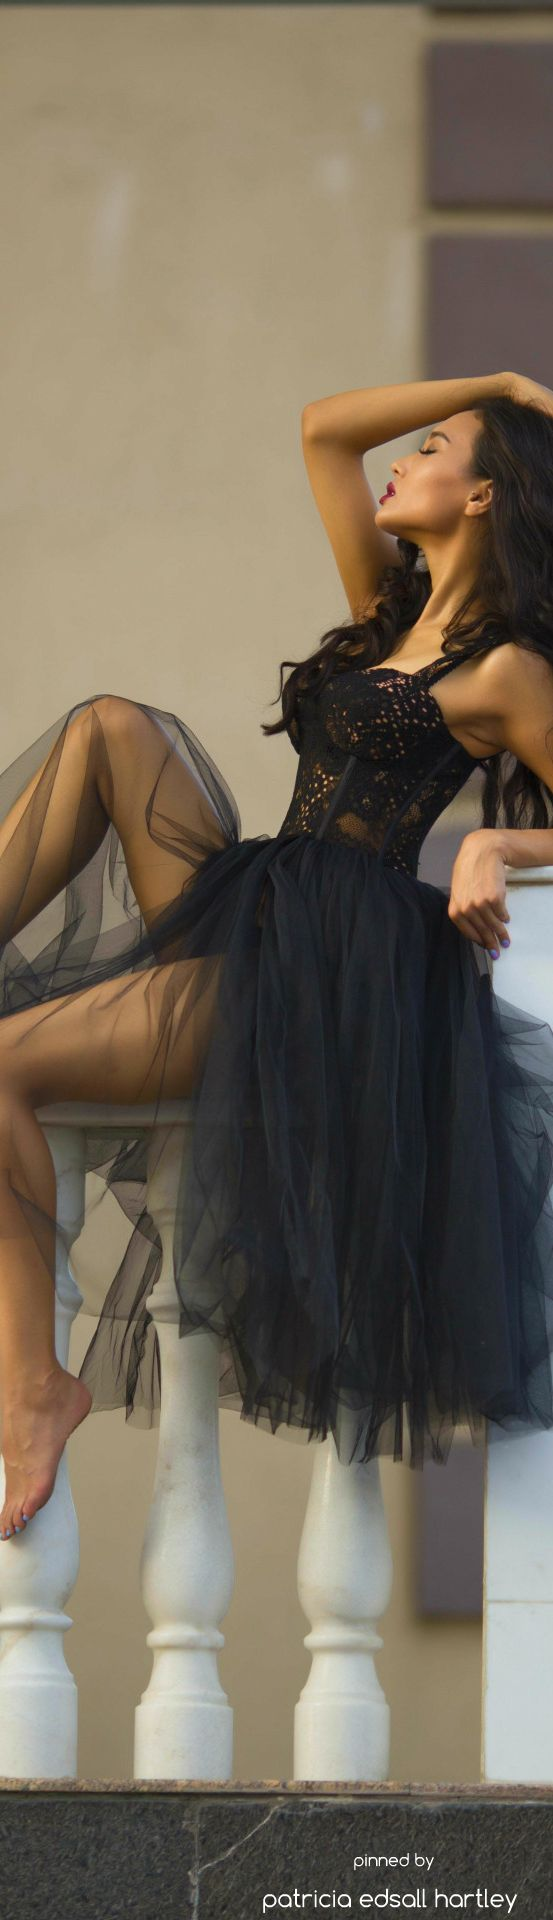 Femme fatale. -Camellia Rogers